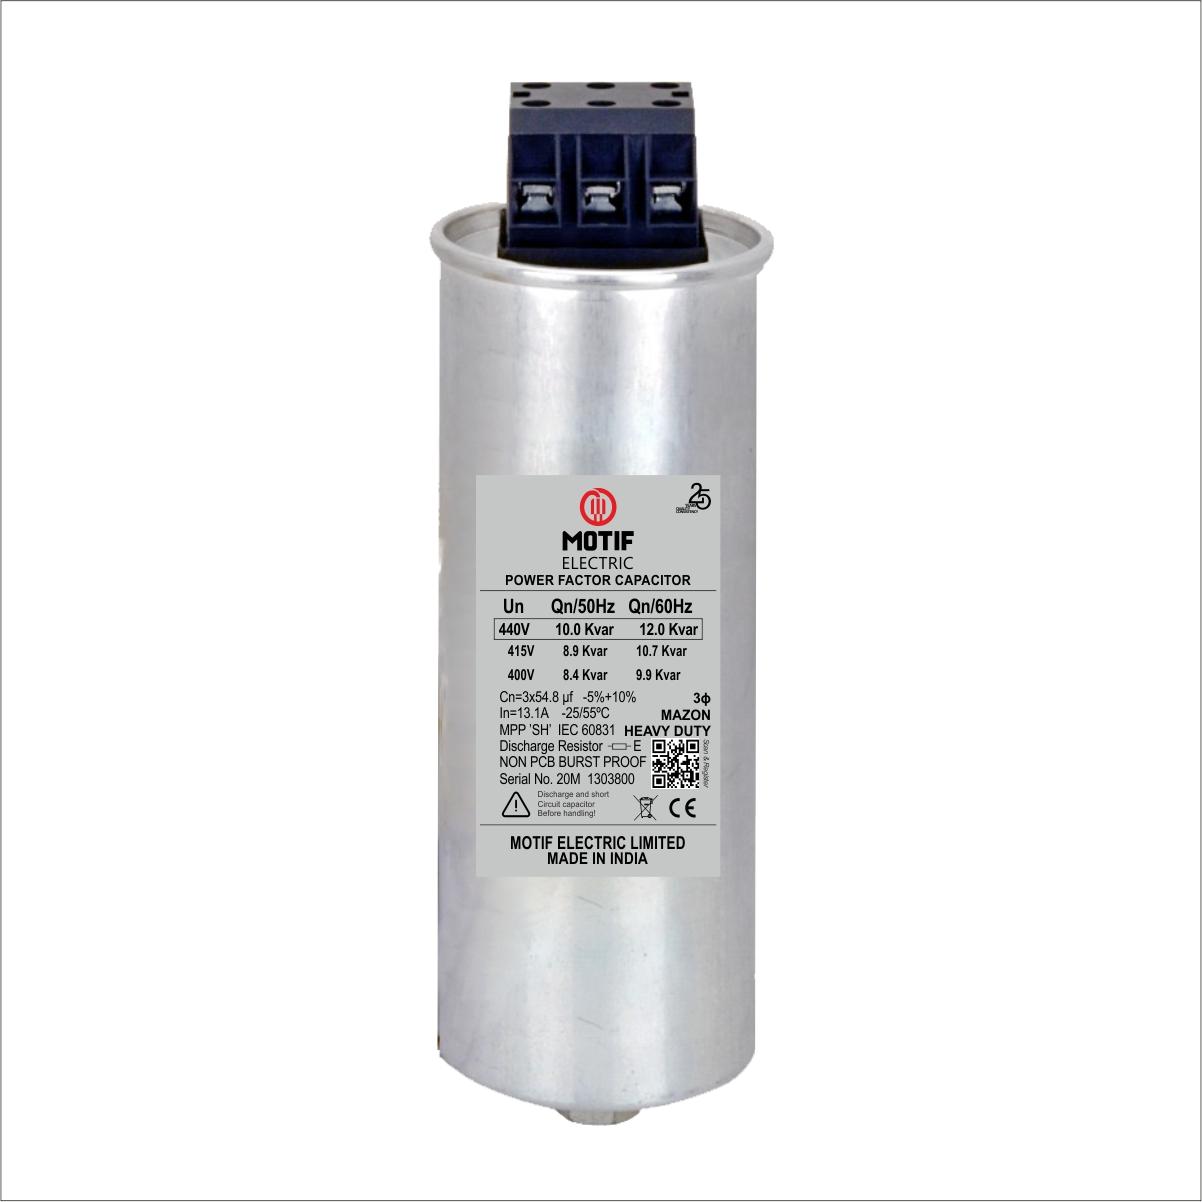 Factory Price 10 Kvar Power Capacitors 440v Power Factor Correction Capacitor 50hz 60hz Made In India Capacitor For Sale Buy 10 Kvar Power Capacitors Power Capacitor 10 Kvar Capacitor 10 Kvar Product On Alibaba Com